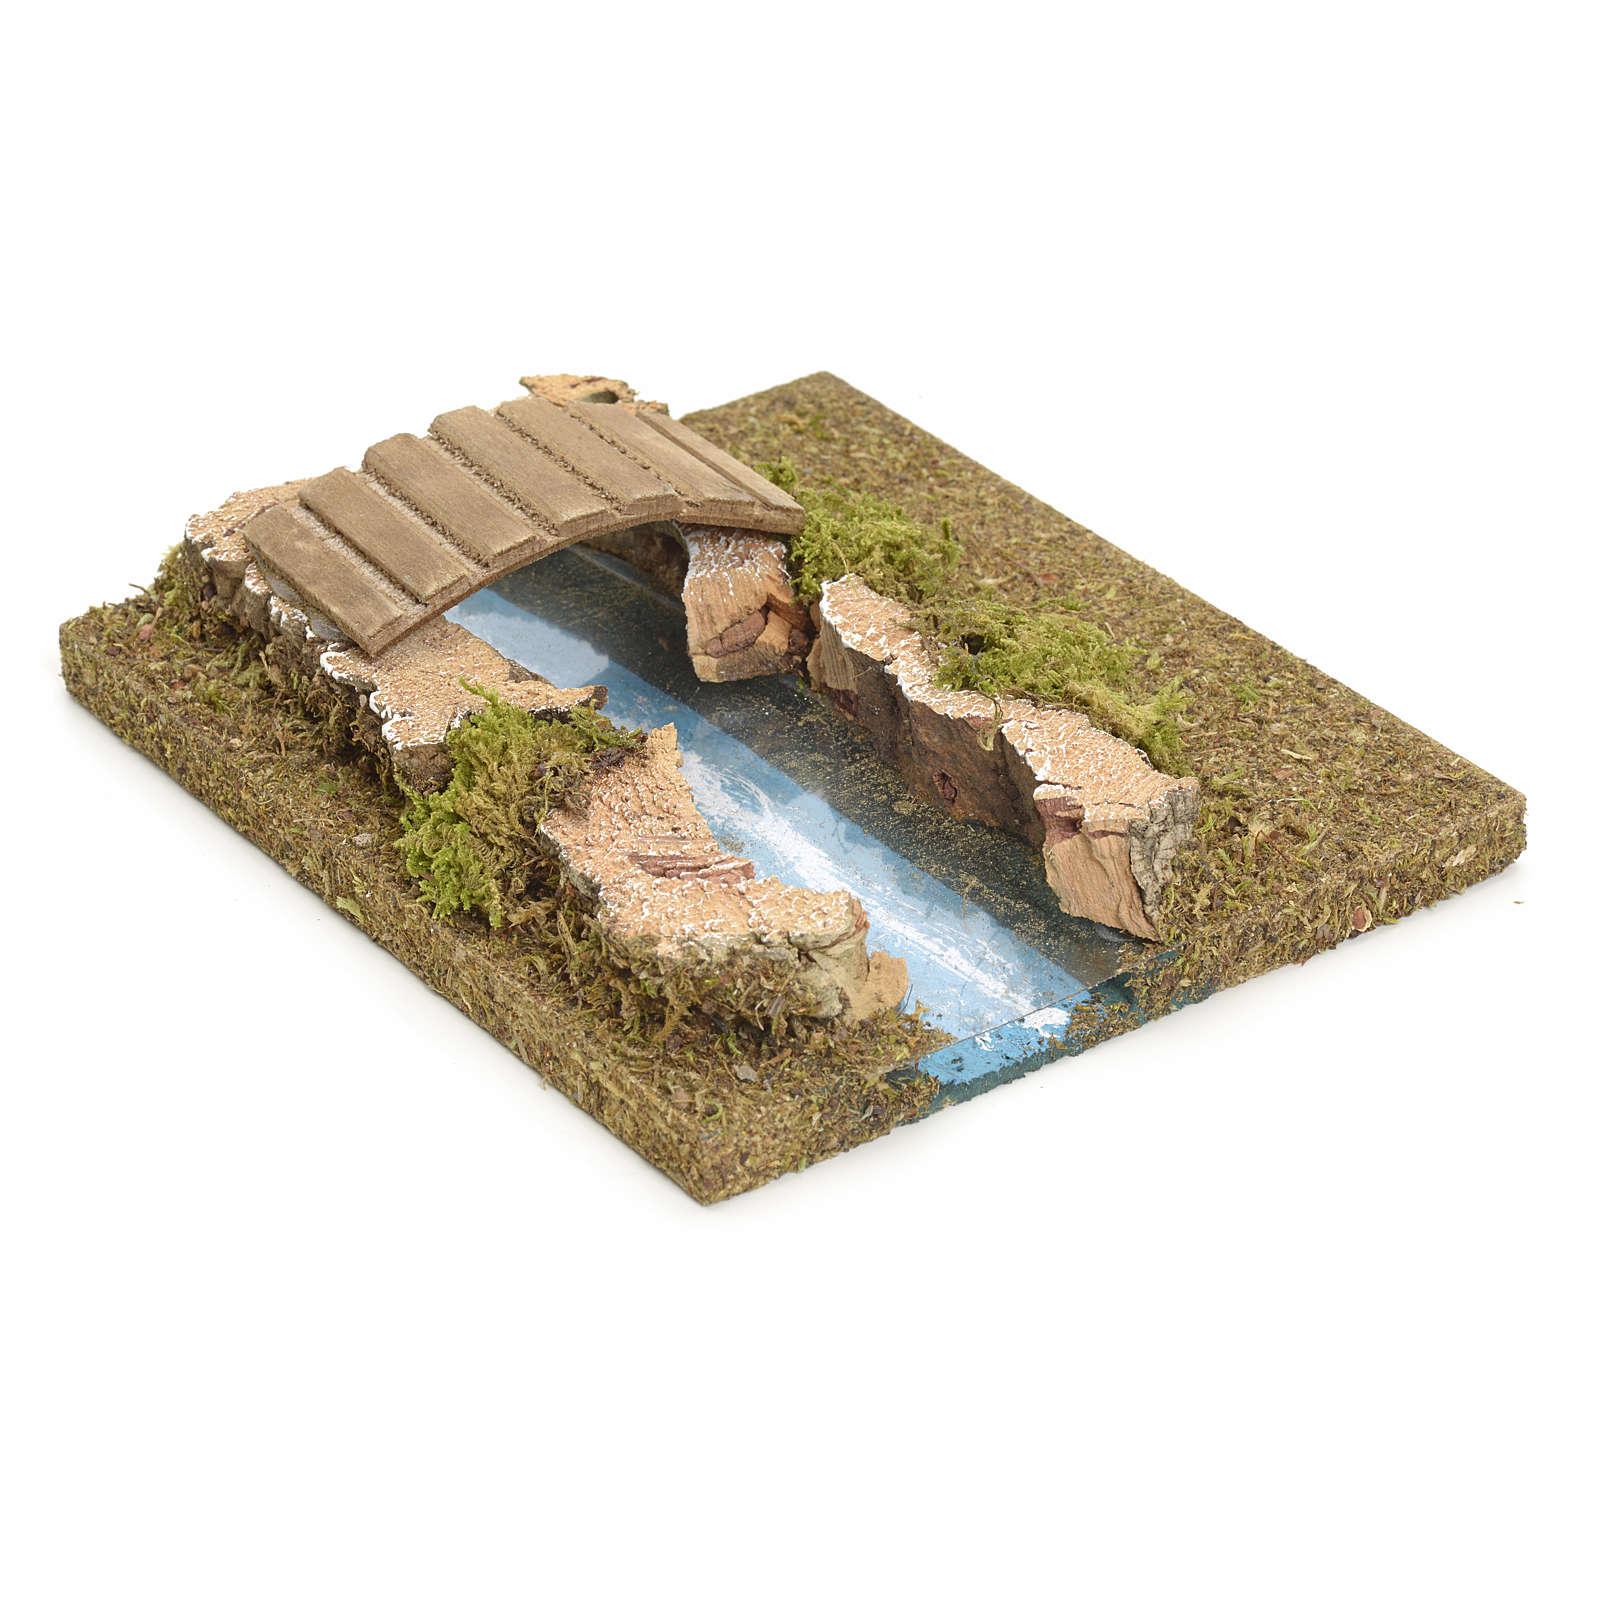 Nativity setting, modular river in cork, small bridge 4